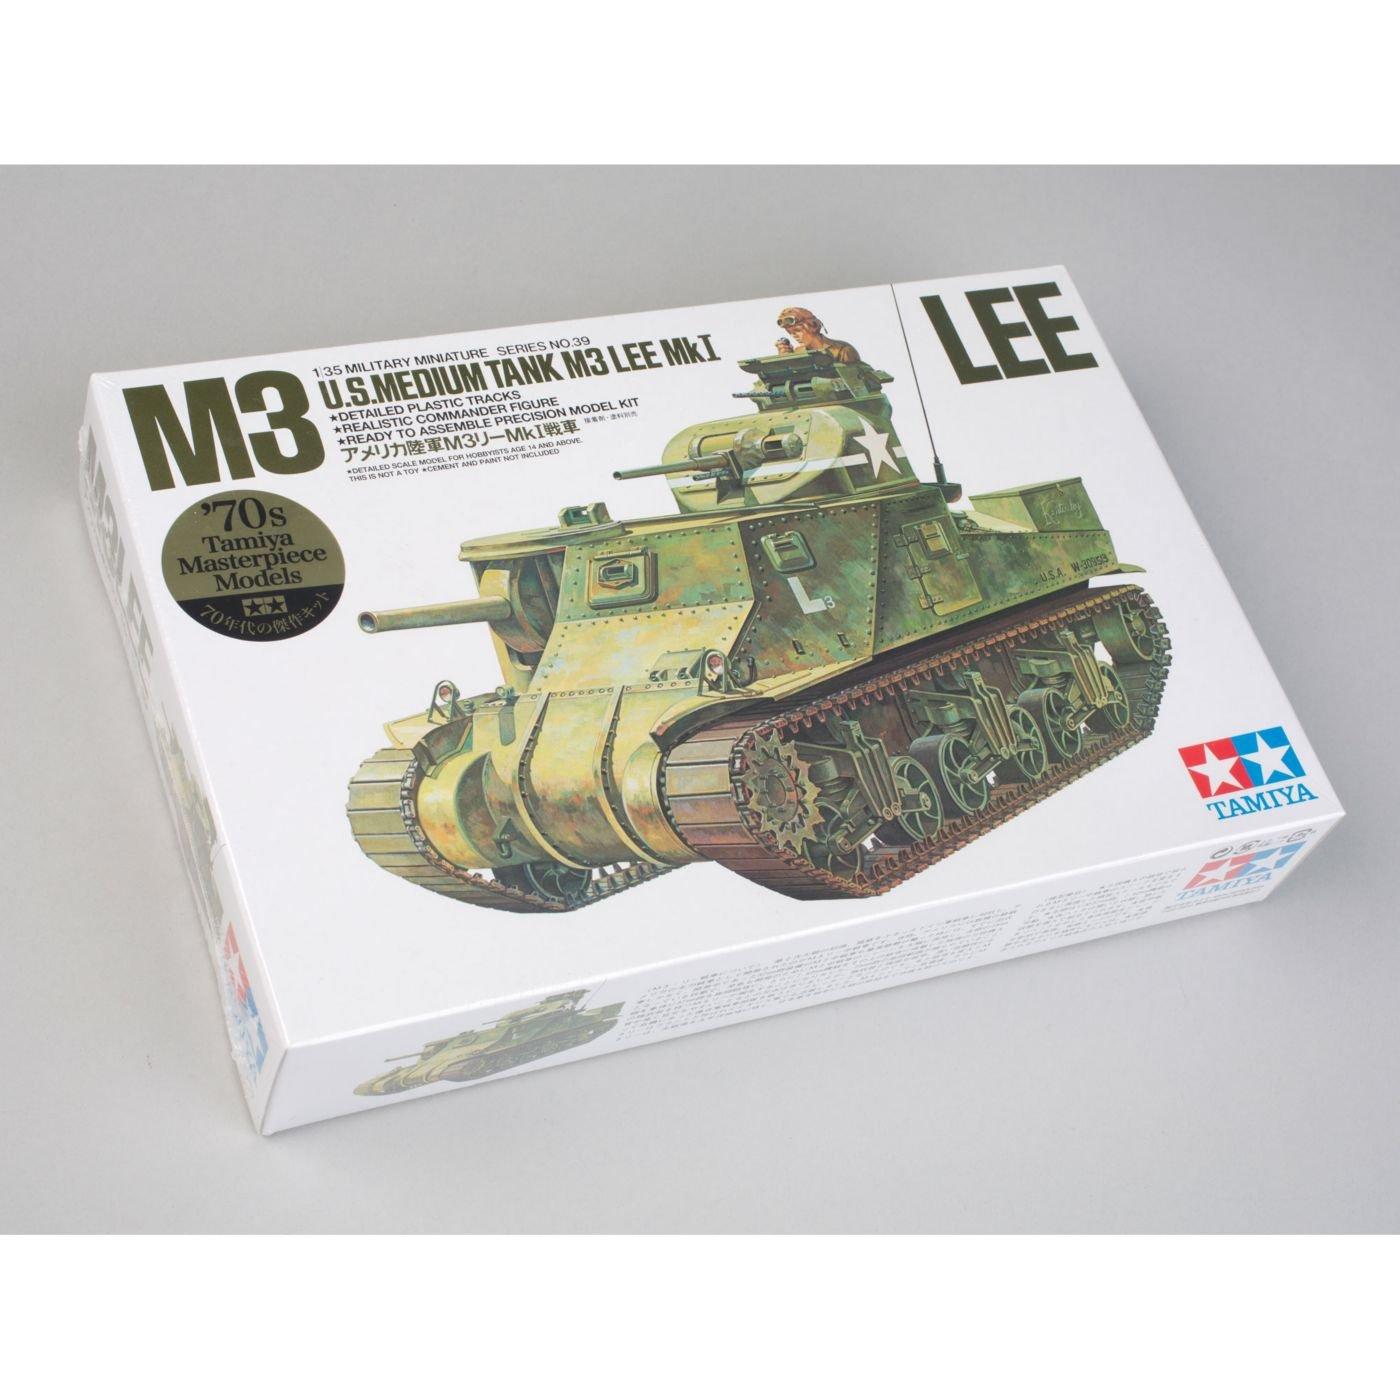 Tamiya America, Inc 1/35 US M3 Tank Lee, TAM35039